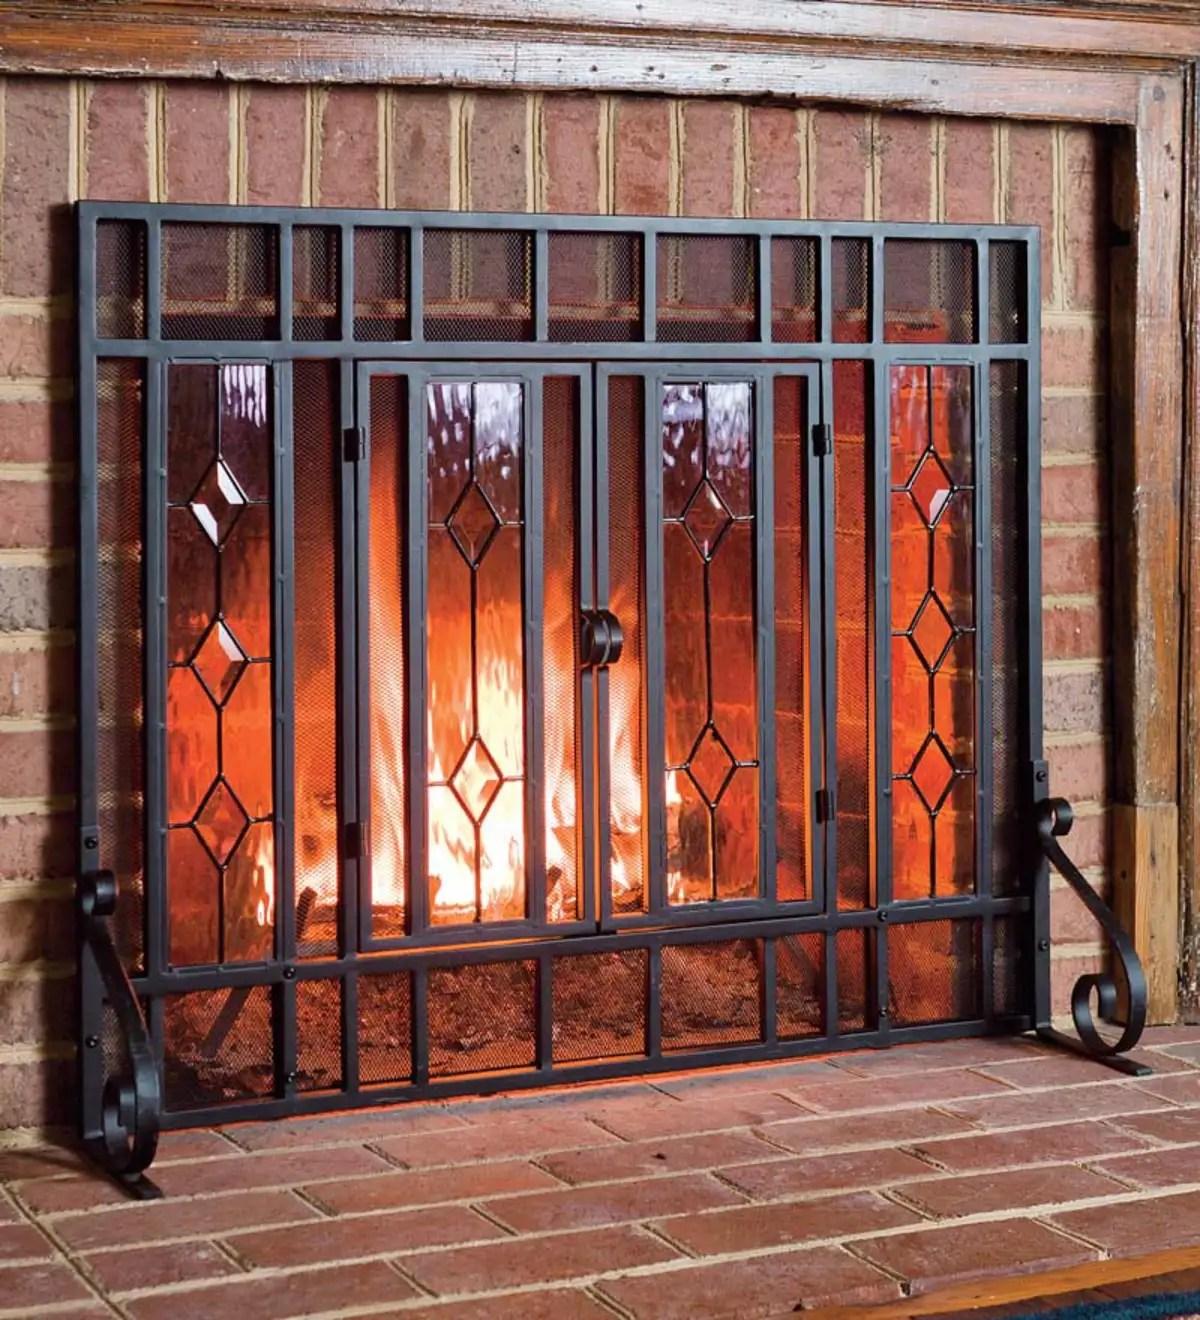 38 W X 31 H Beveled Glass Diamond Fireplace Screen With